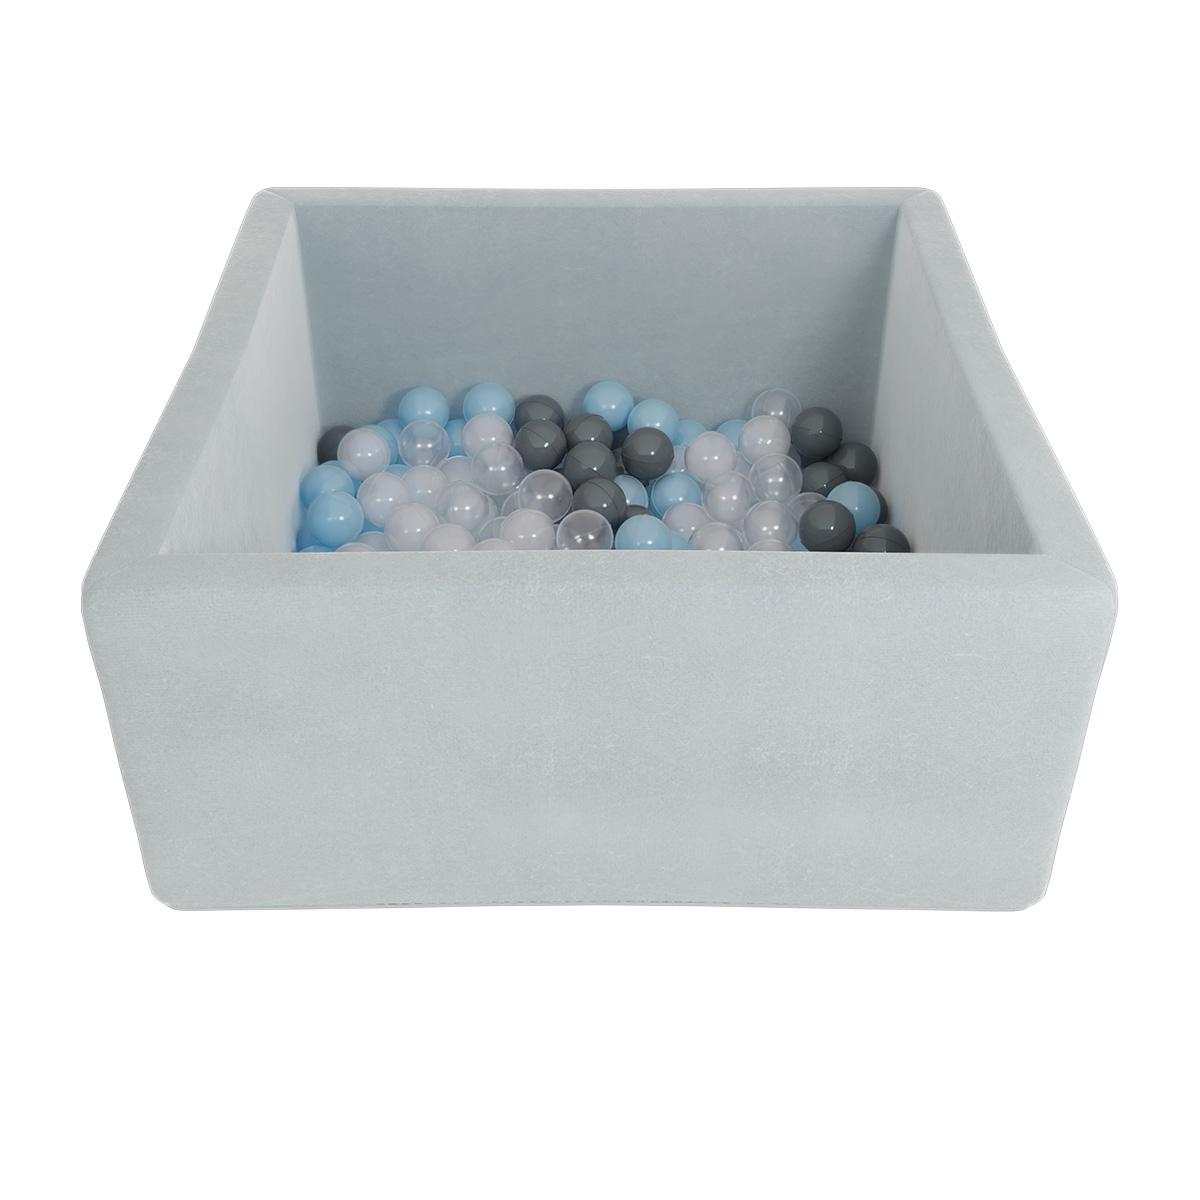 Купить Детский сухой бассейн Romana Airpool Box, серый + 300 шаров, Romana (Романа)